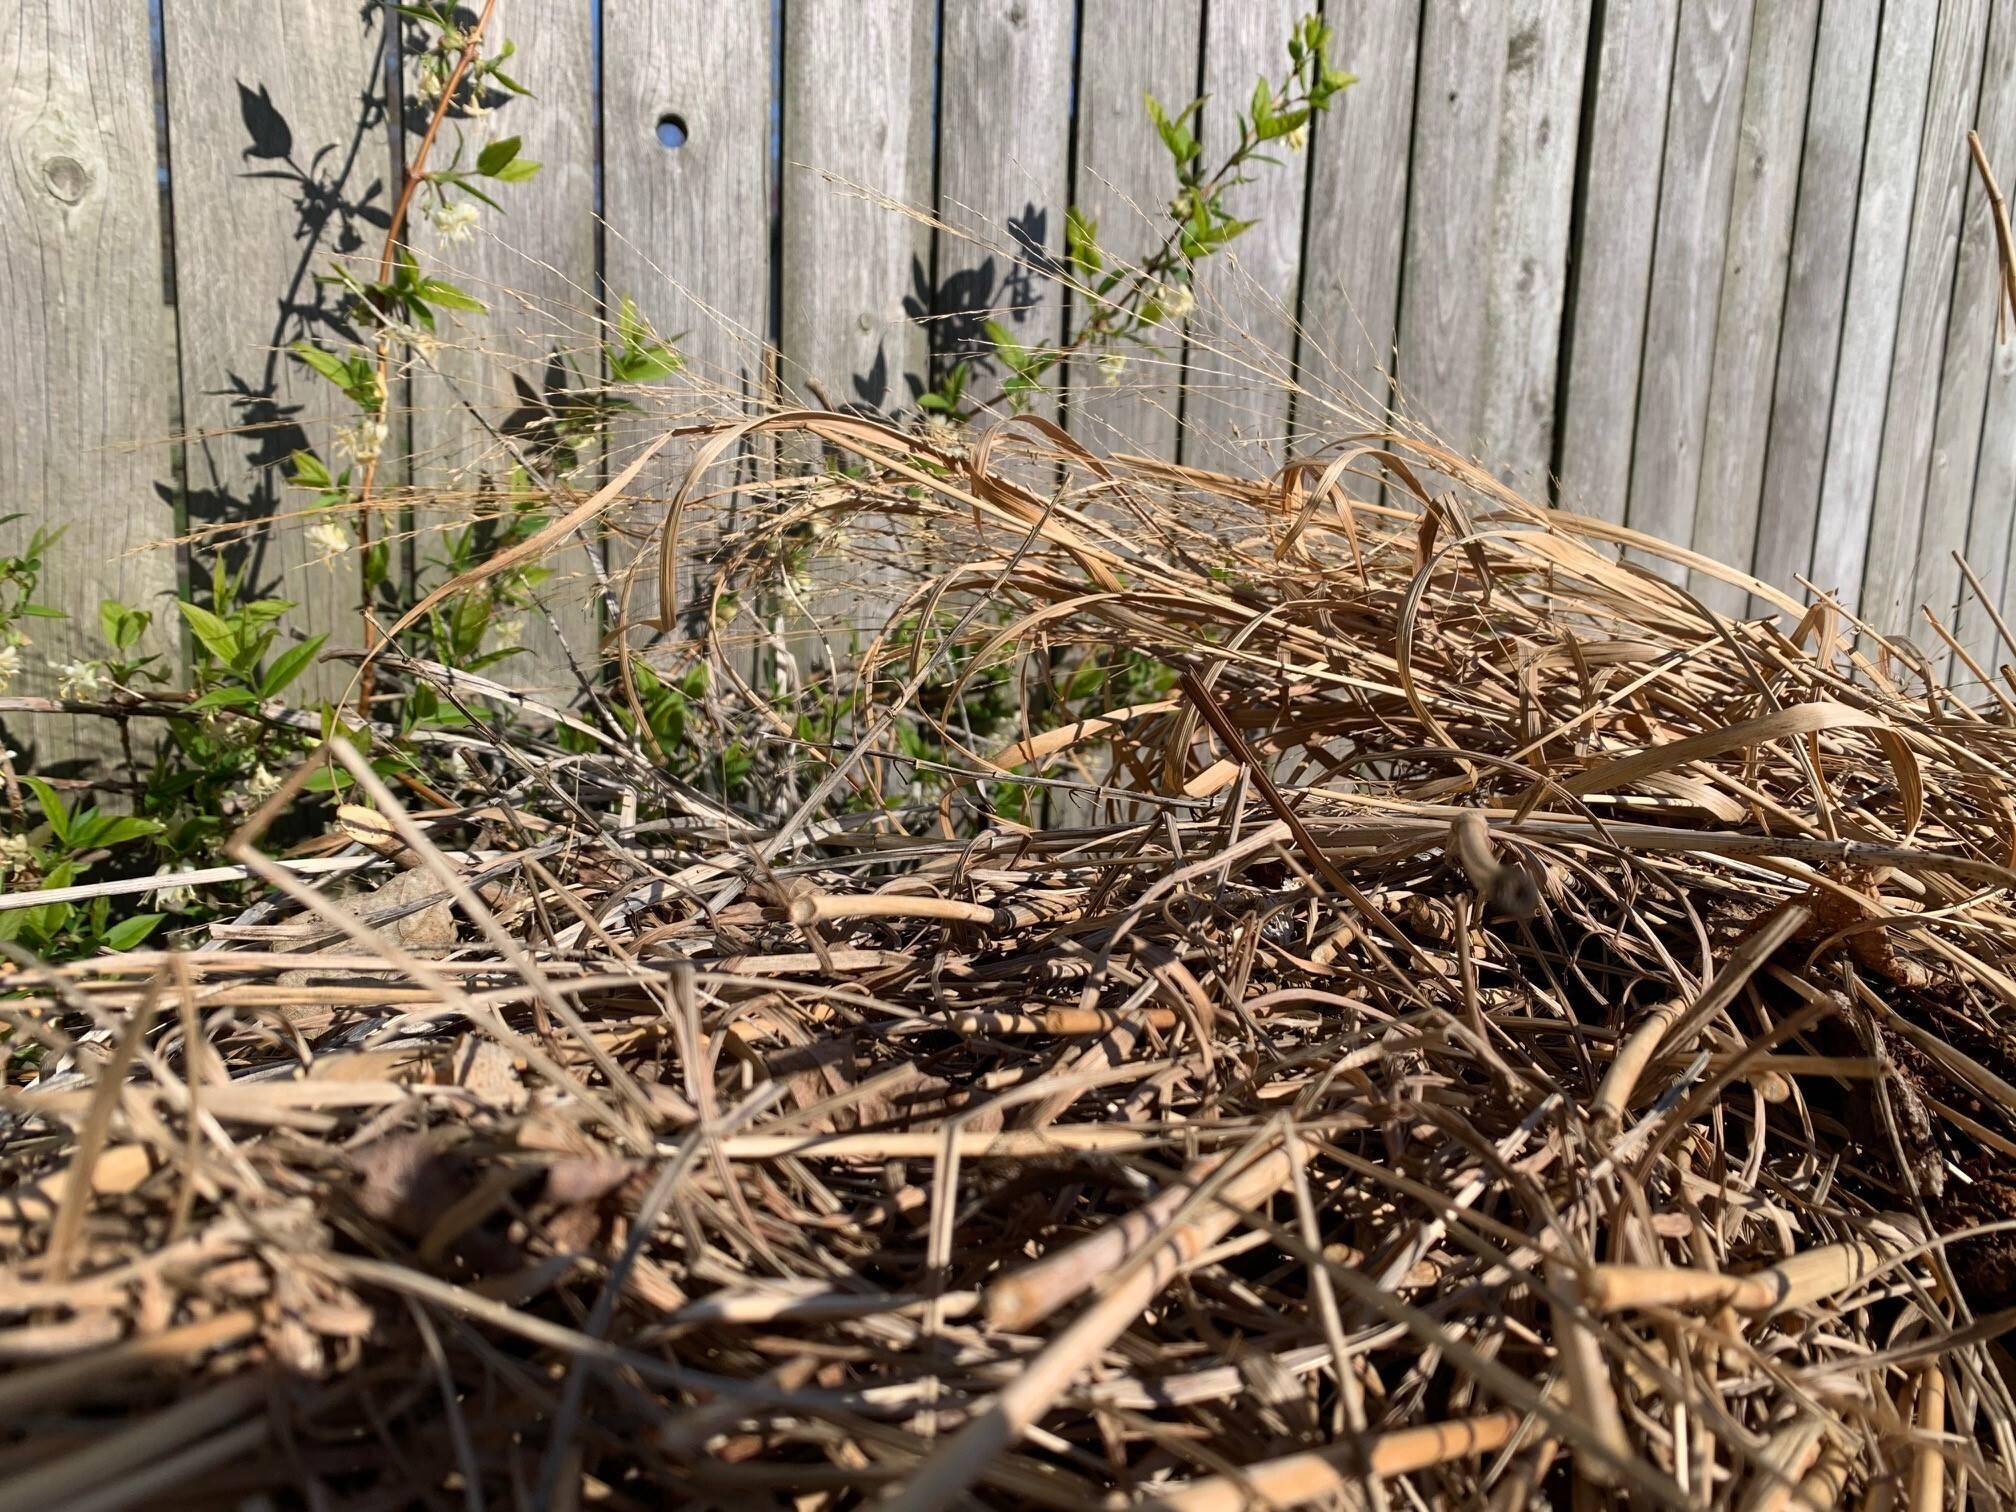 Pile of plant debris in a garden